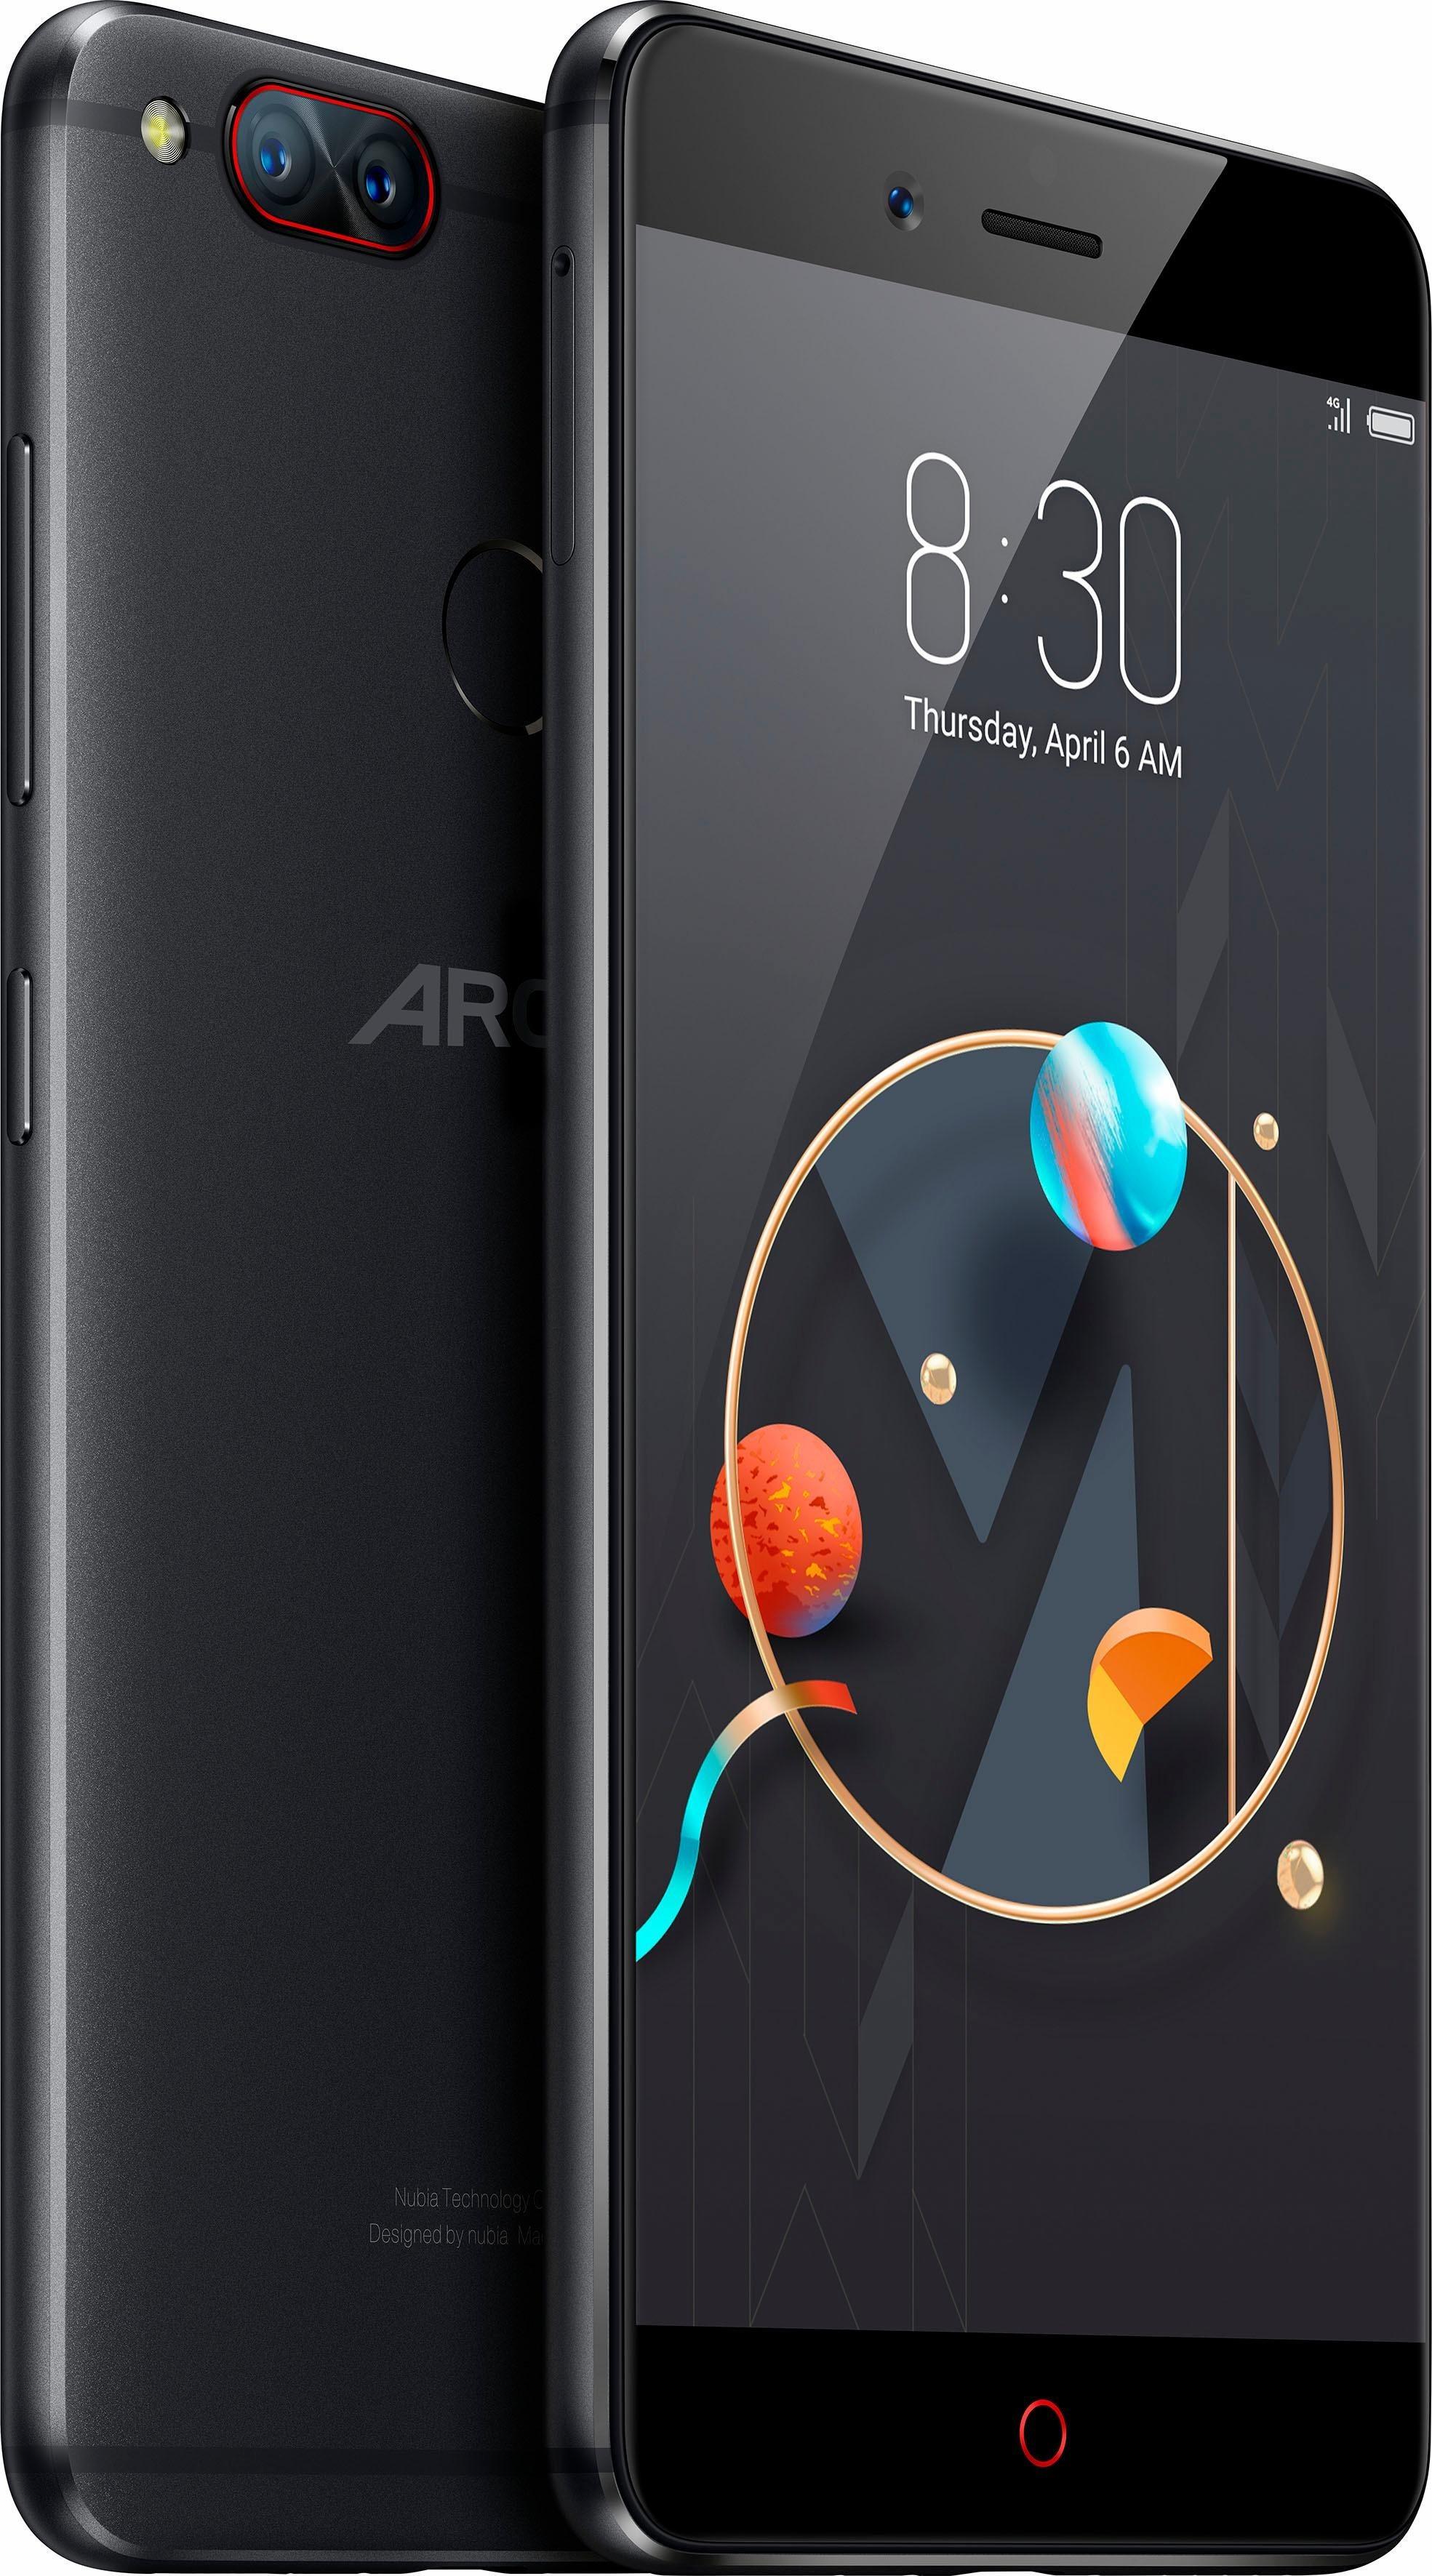 Diamond Alpha Smartphone (13,2 cm/5,2 Zoll, 64 GB Speicherplatz, 13 MP Kamera)